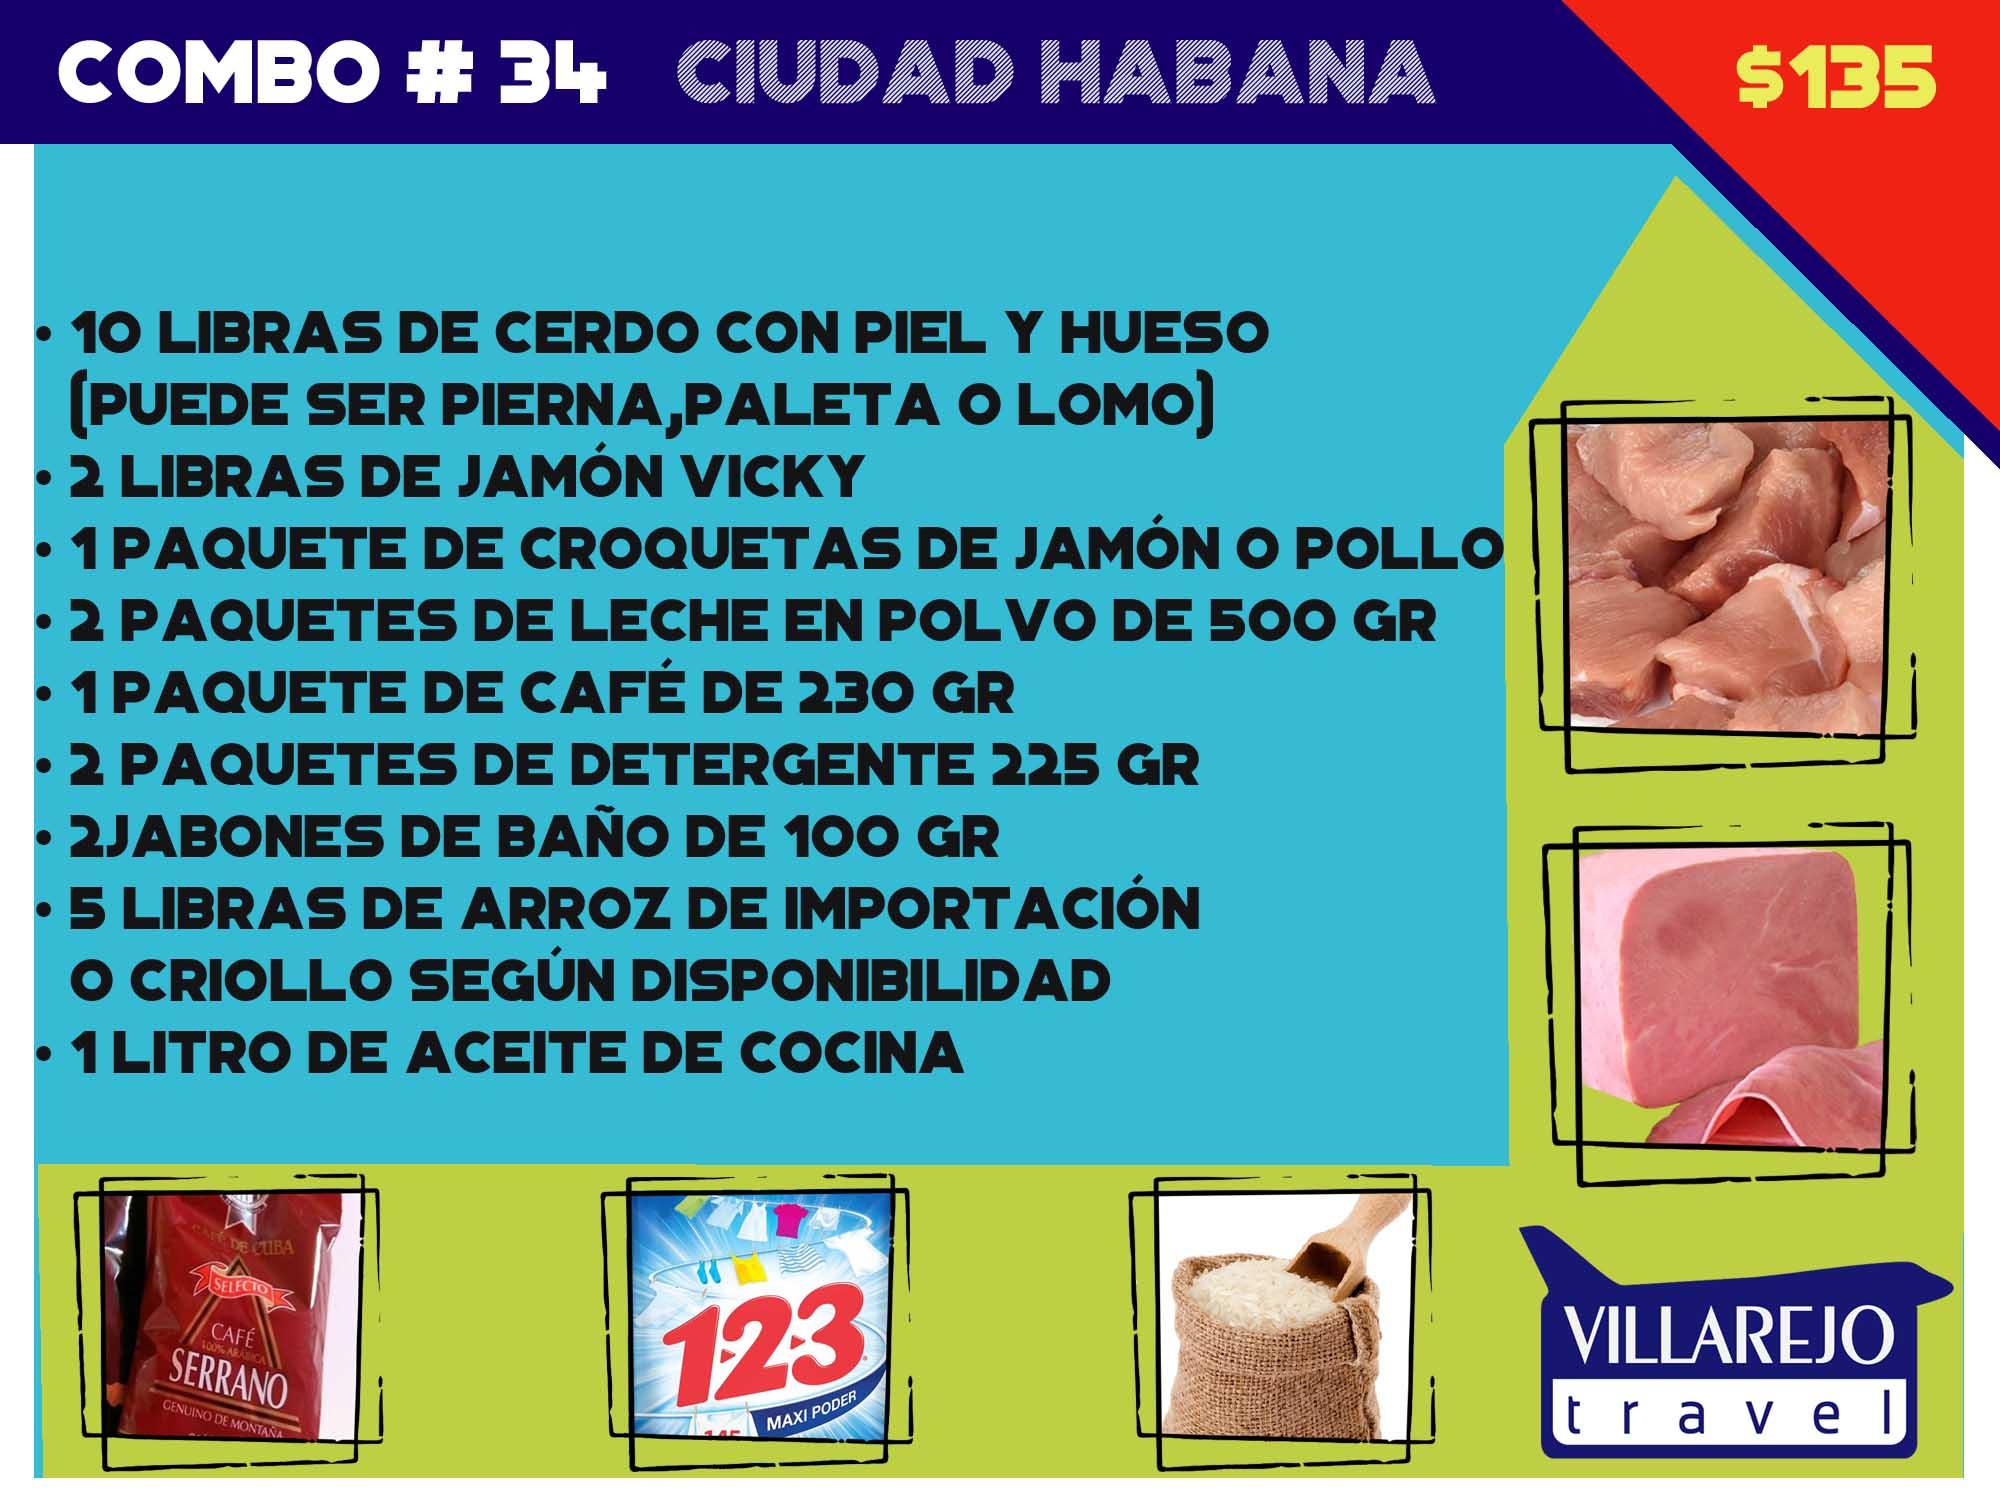 COMBO # 34  CIUDAD LA HABANA